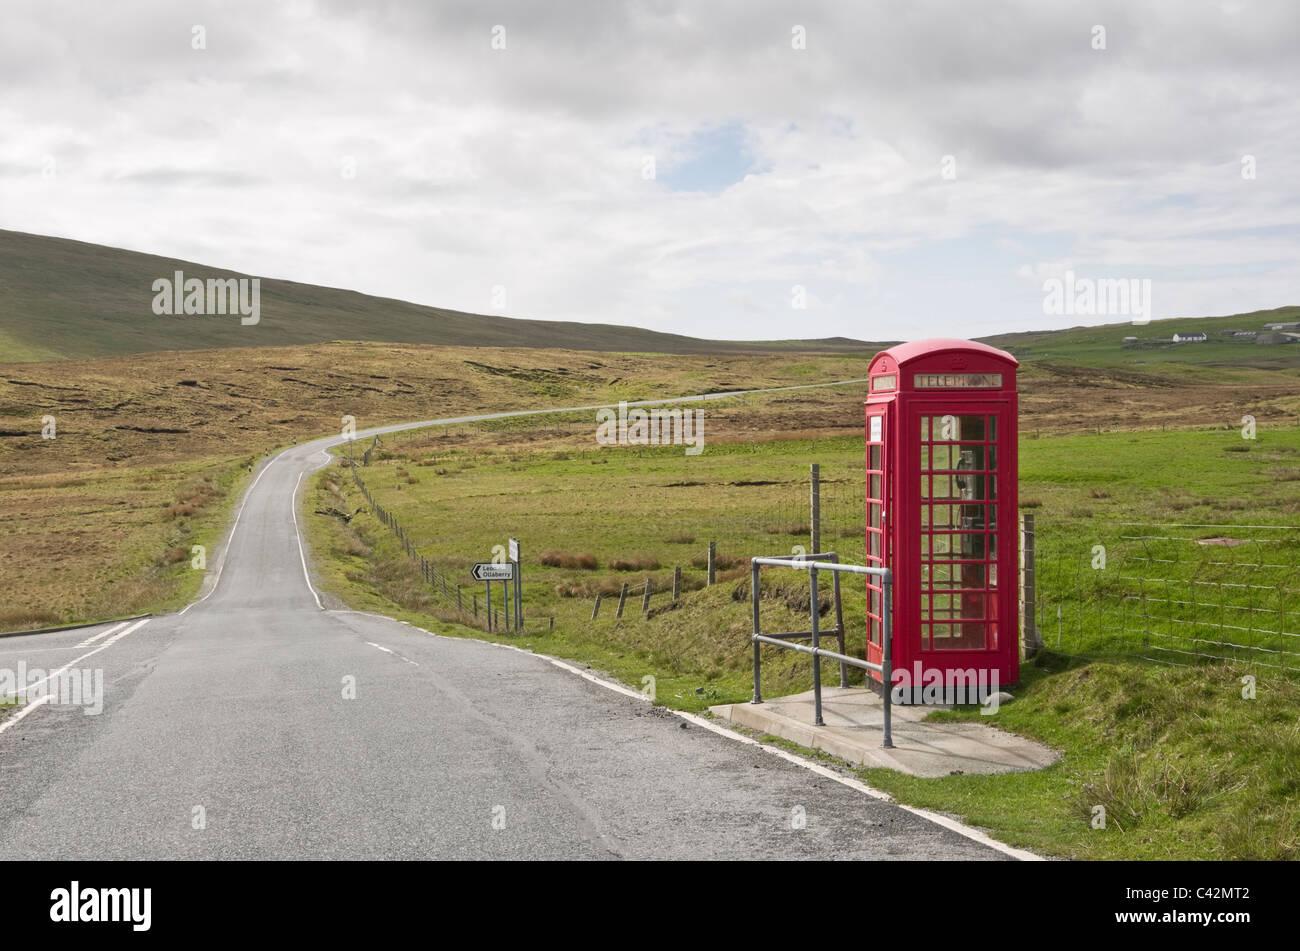 Voe, Northmavine, Shetland Islands, Scotland, UK, Britain. Single track country road and red telephone kiosk. - Stock Image